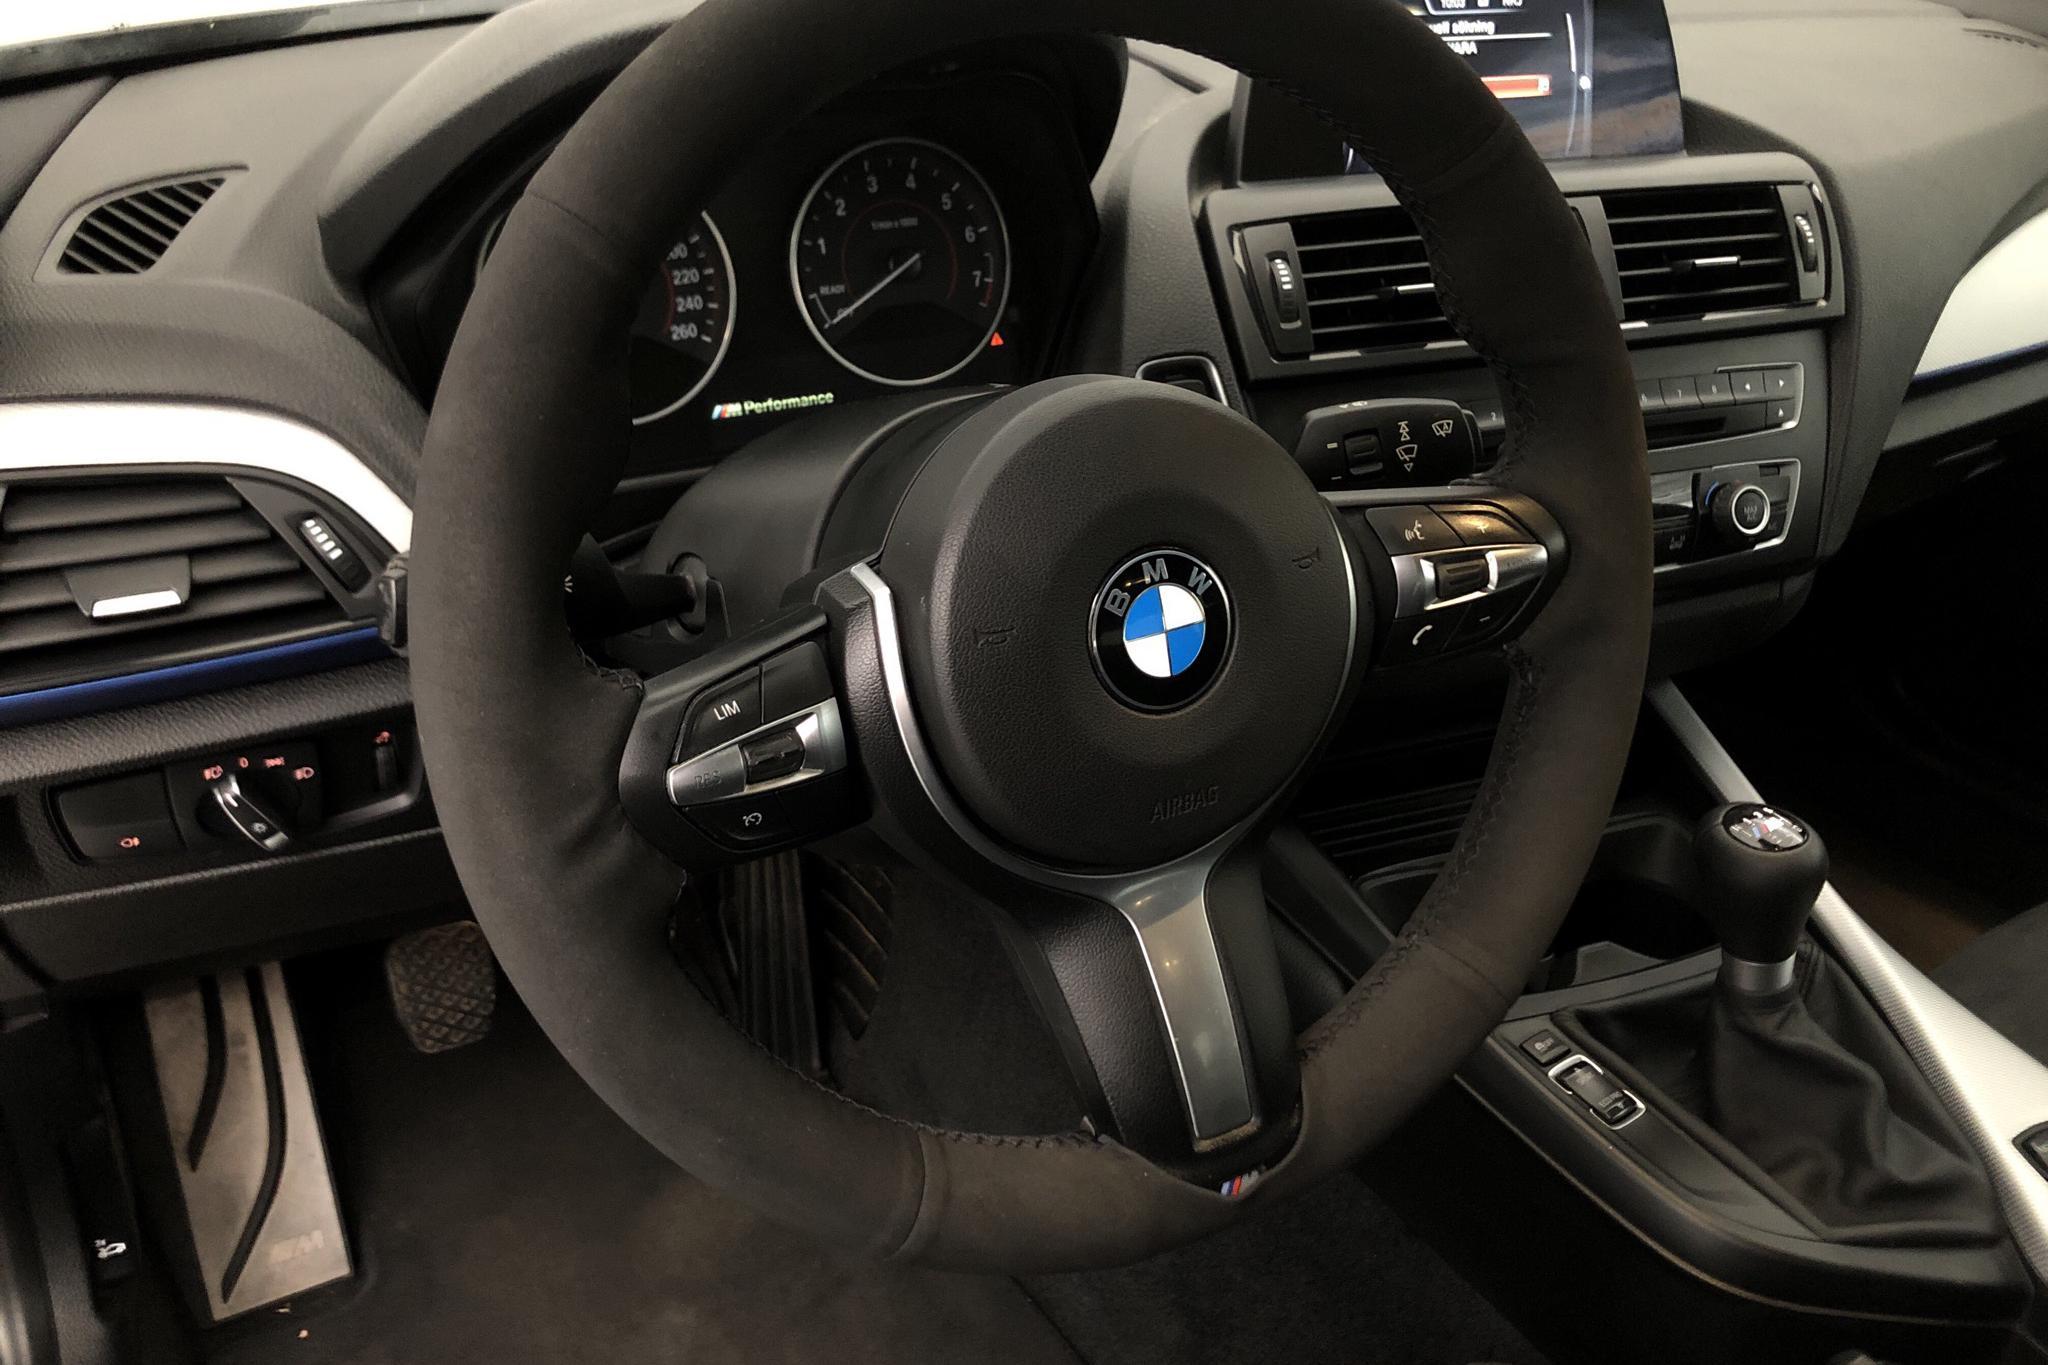 BMW M235i Coupé, F22 (326hk) - 158 480 km - Manual - black - 2015